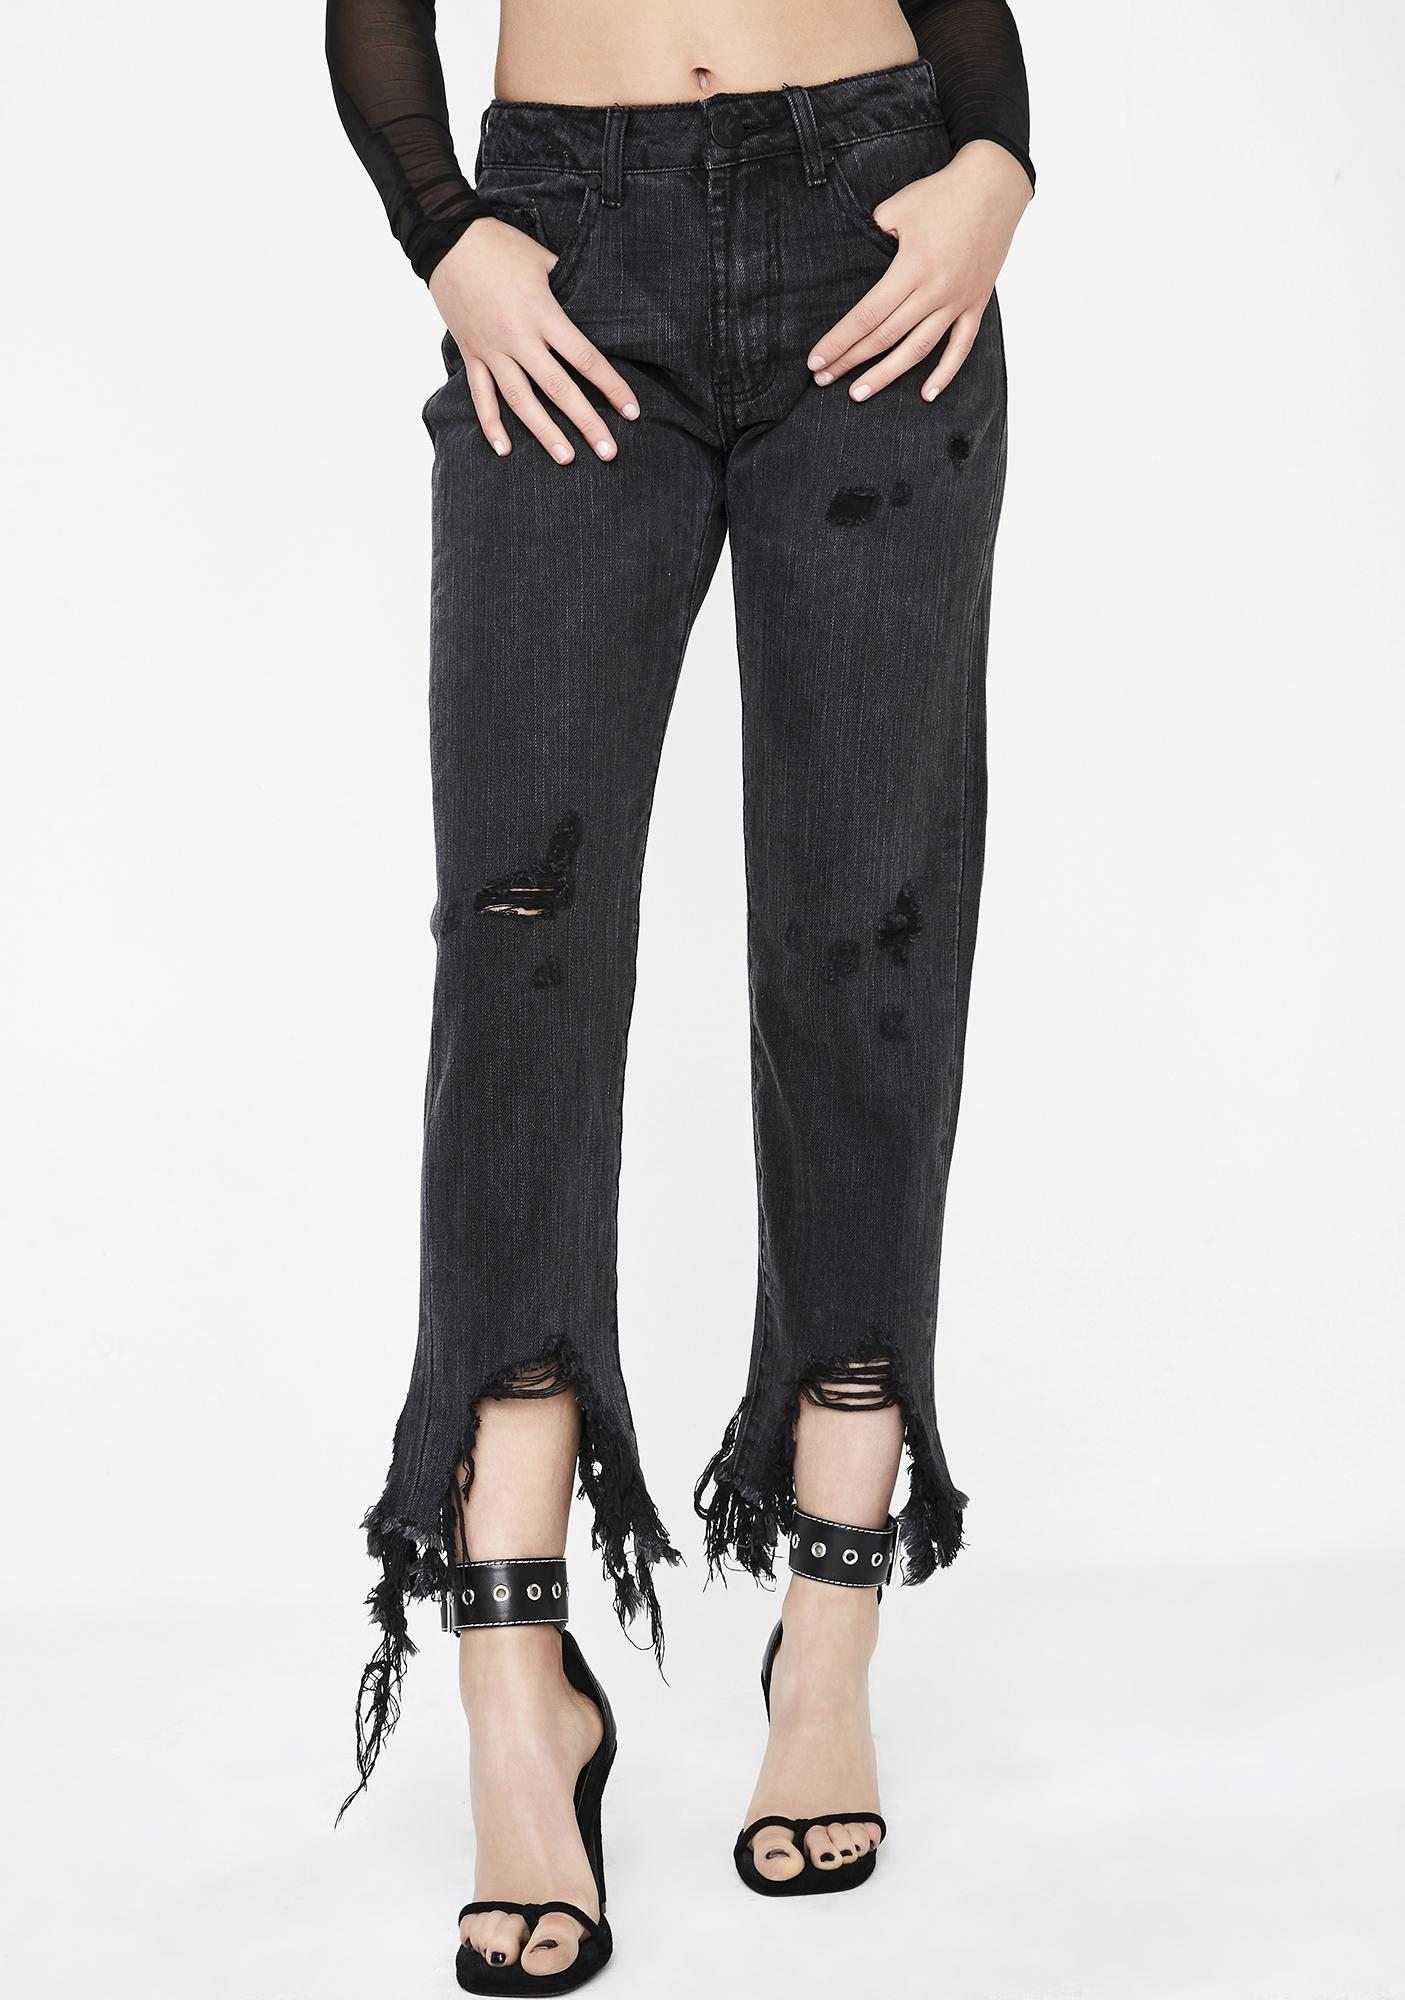 One Teaspoon Volcanic Awesome Baggies High Waist Jeans